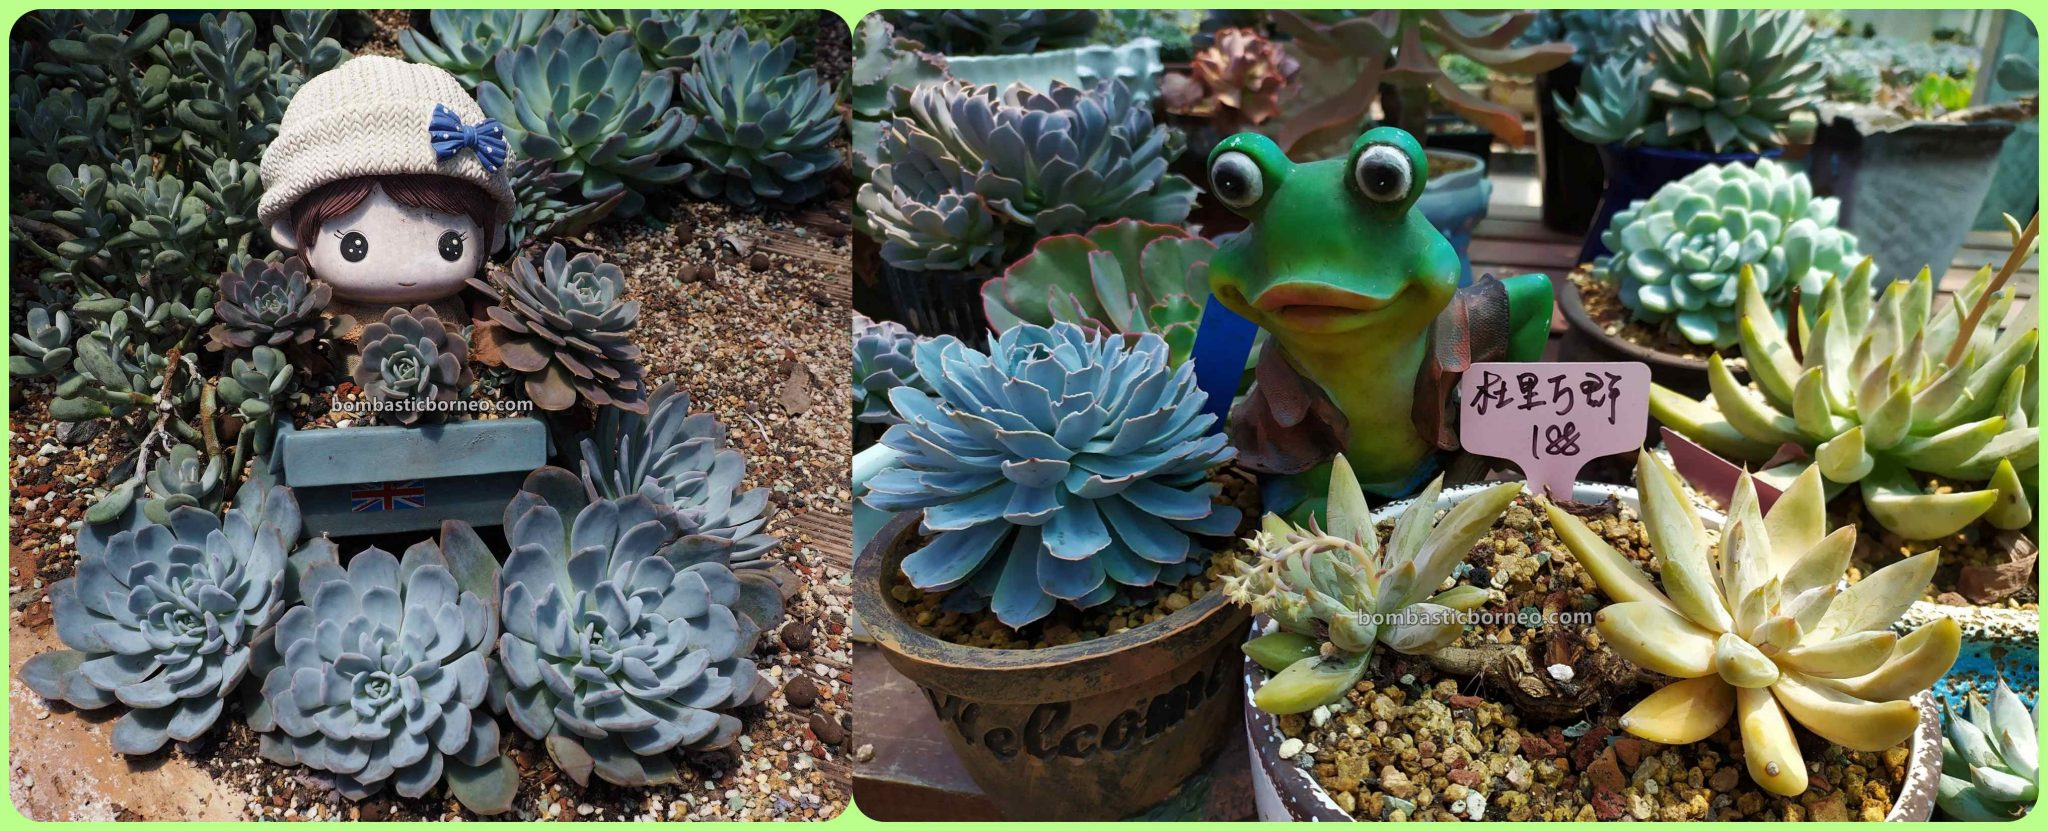 LS Succulent Garden, Succulents, cactus, Desert Plants, Tanaman Kaktus, backpackers, Sarawak, flora, nature, Discover Miri City, hobby, Malaysia, Tourism, Travel Guide, Borneo